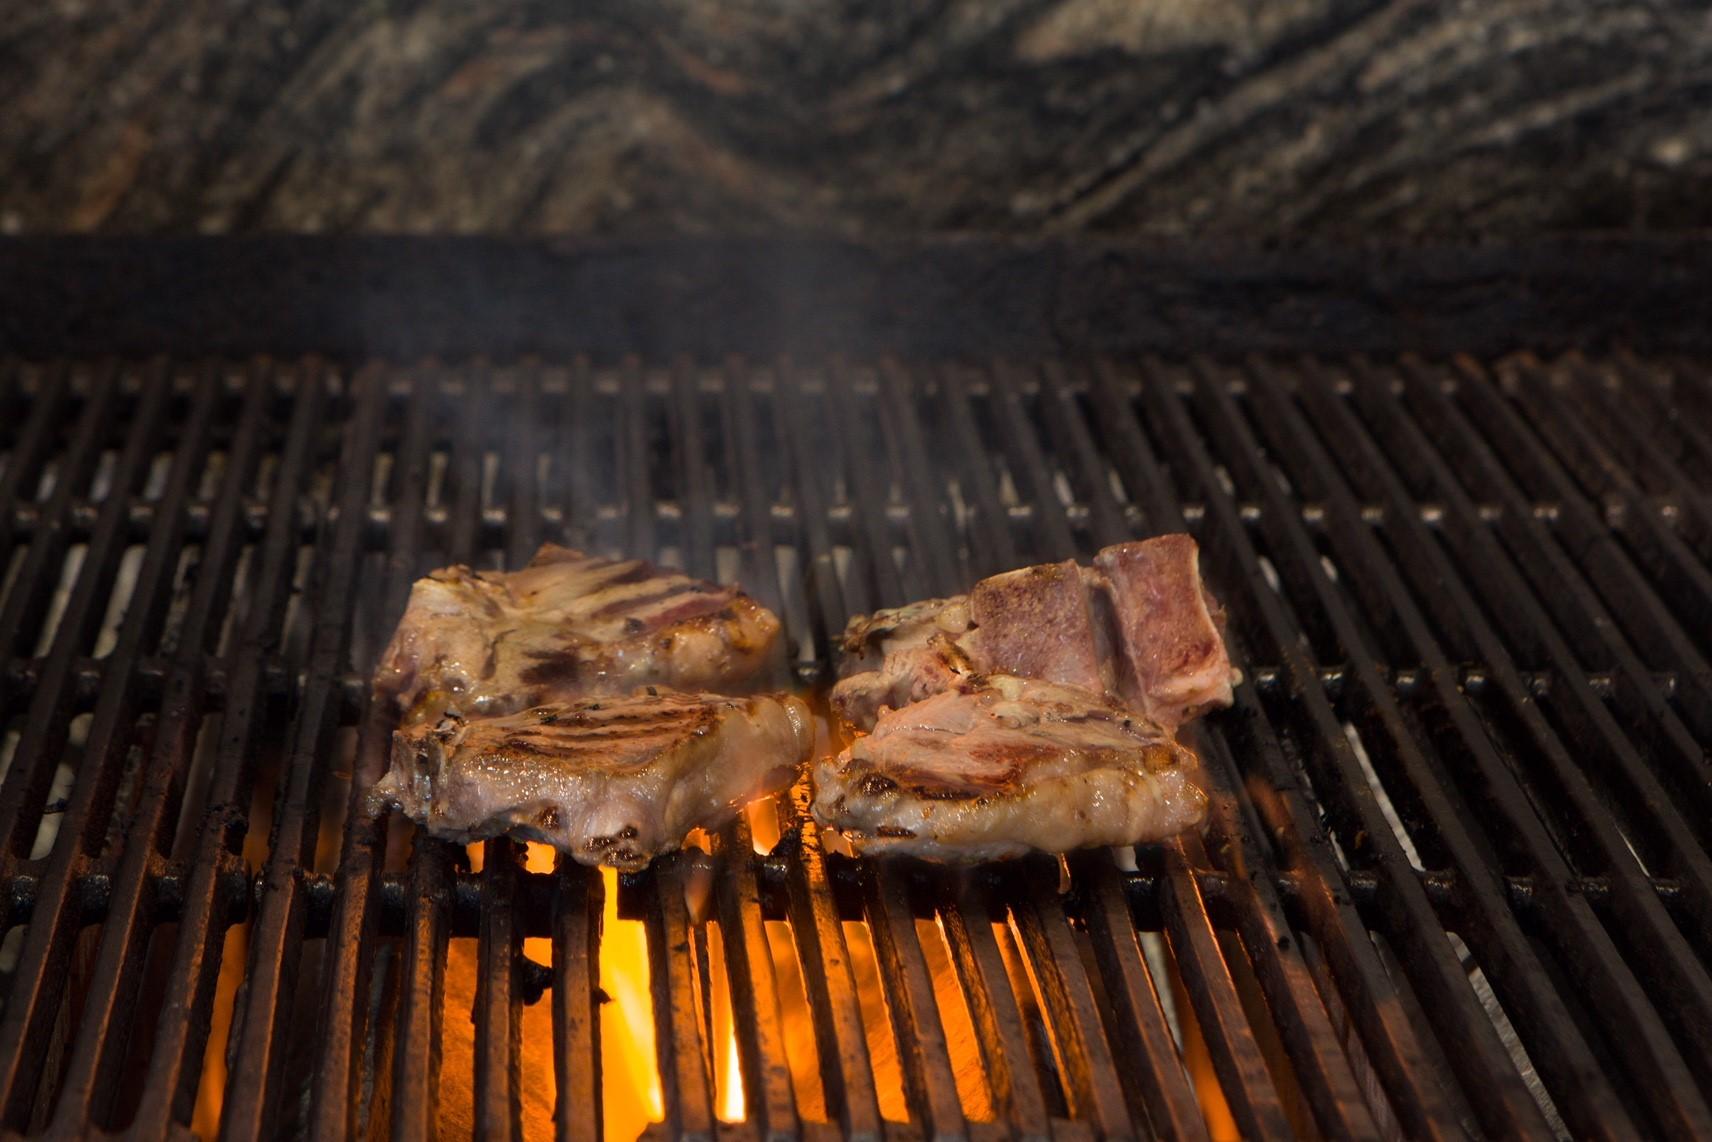 Grilled Lamb Chops $4.95 each